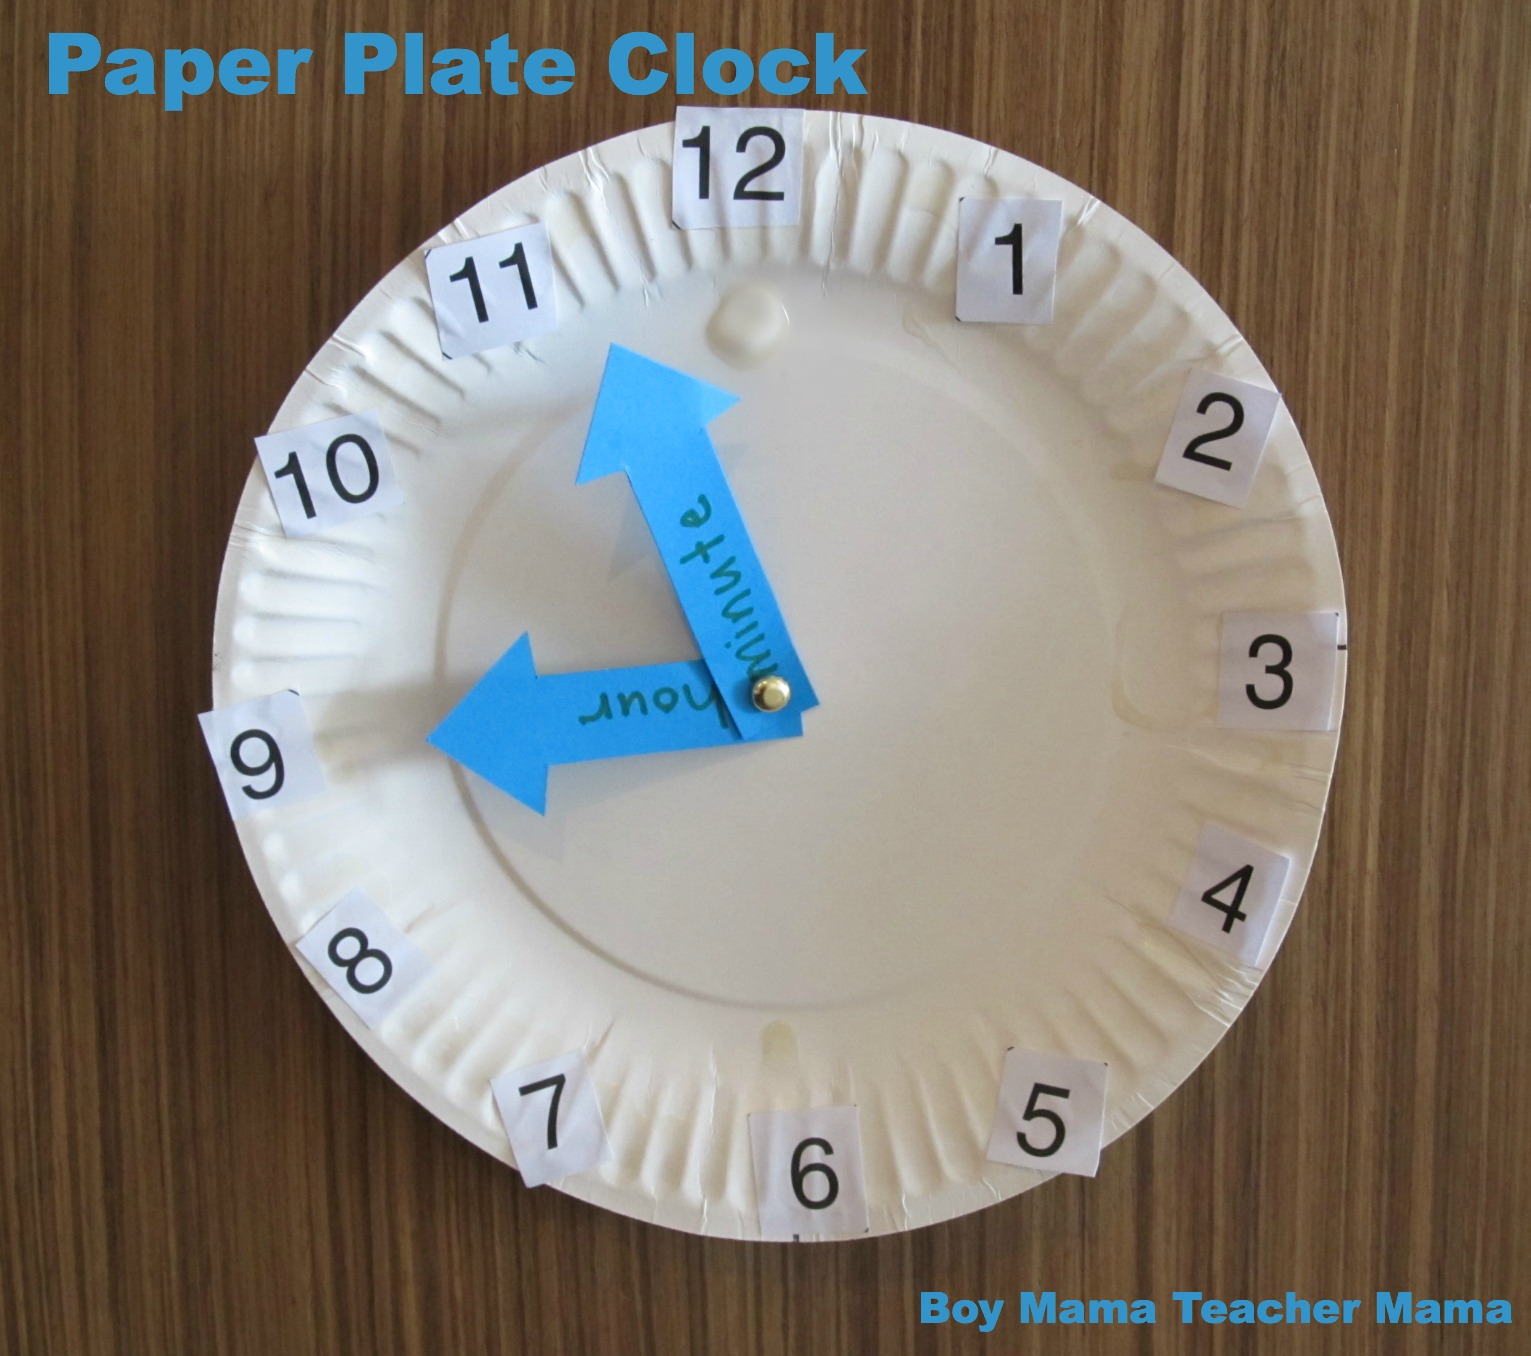 BMTM Paper Plate Clock & BMTM Paper Plate Clock - Boy Mama Teacher Mama